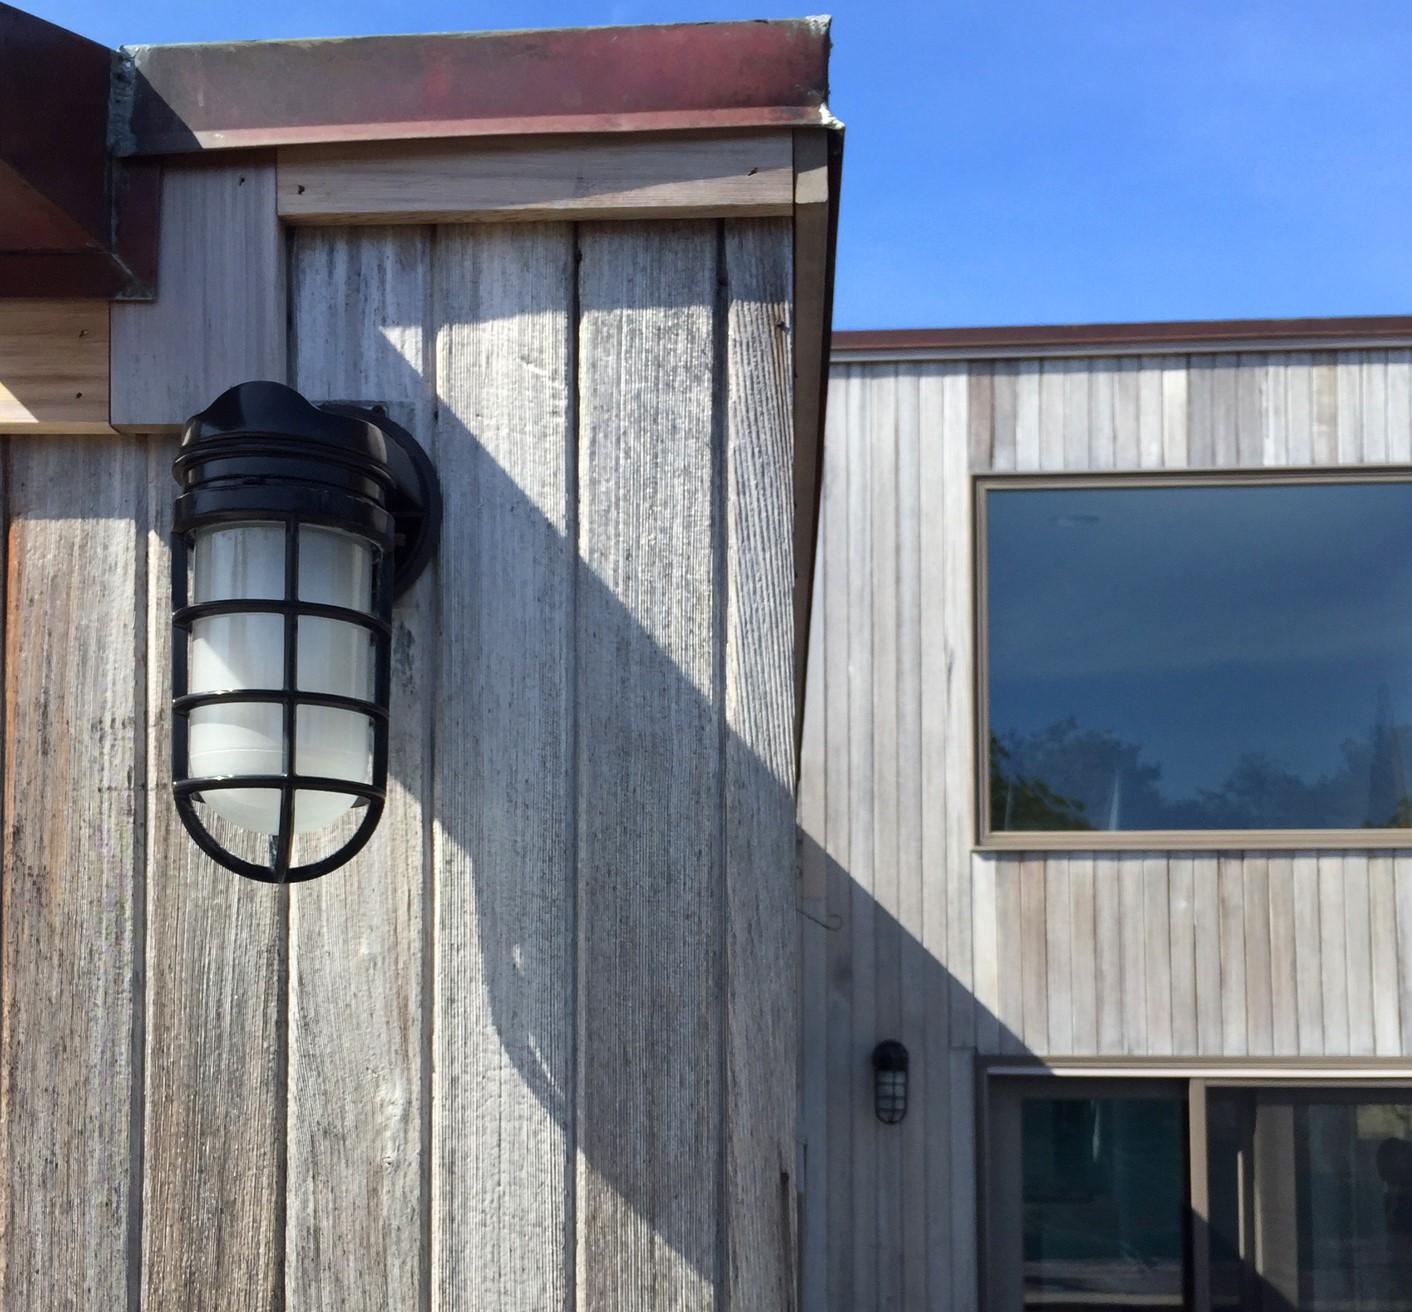 nautical wall sconces lend modern look